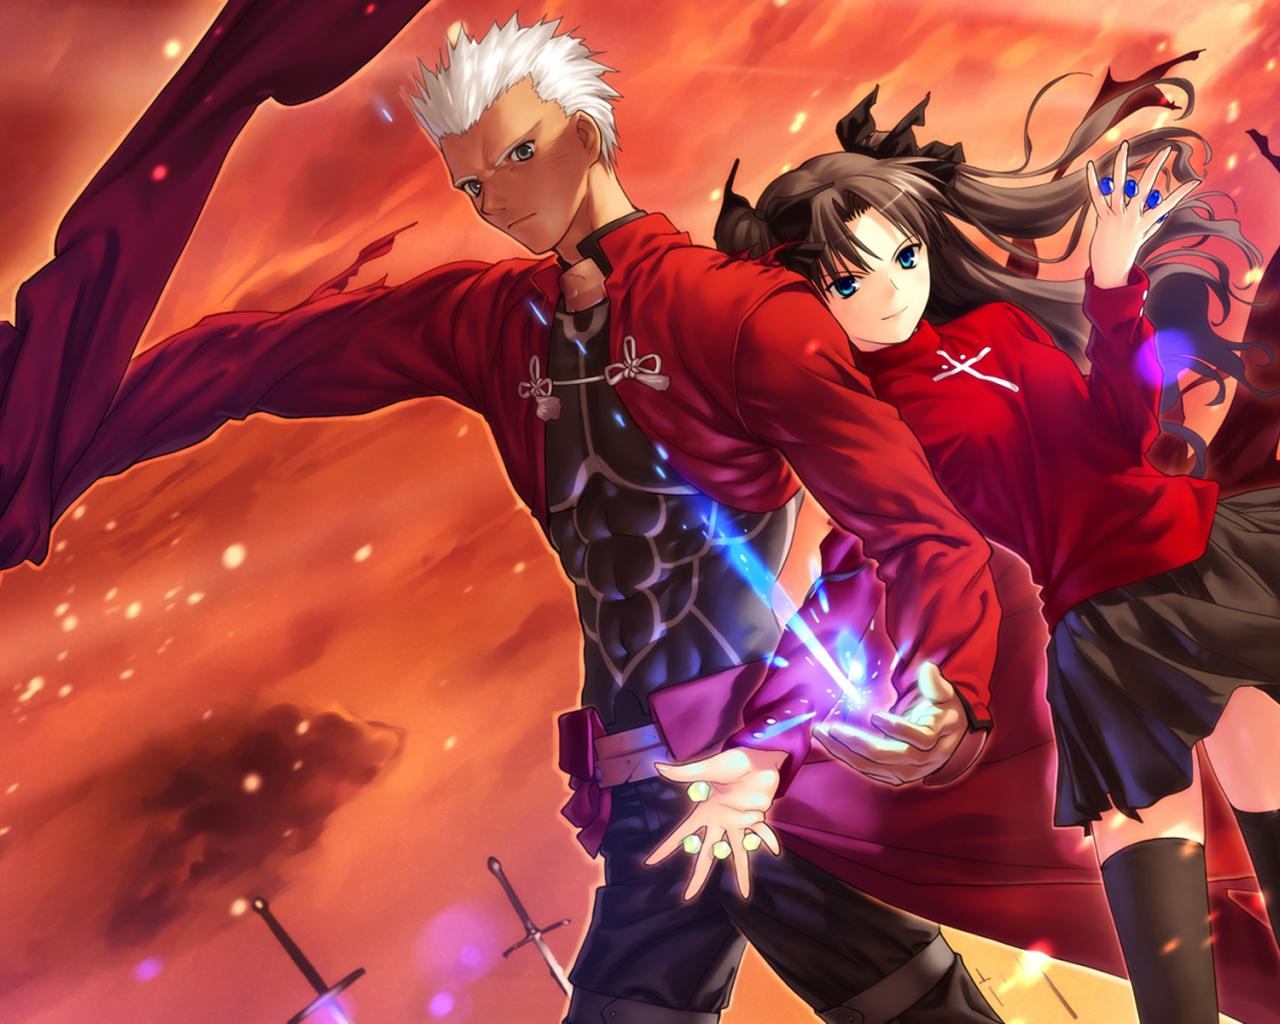 fate stay night fate stay night fate series tohsaka rin wallpaper 1280x1024